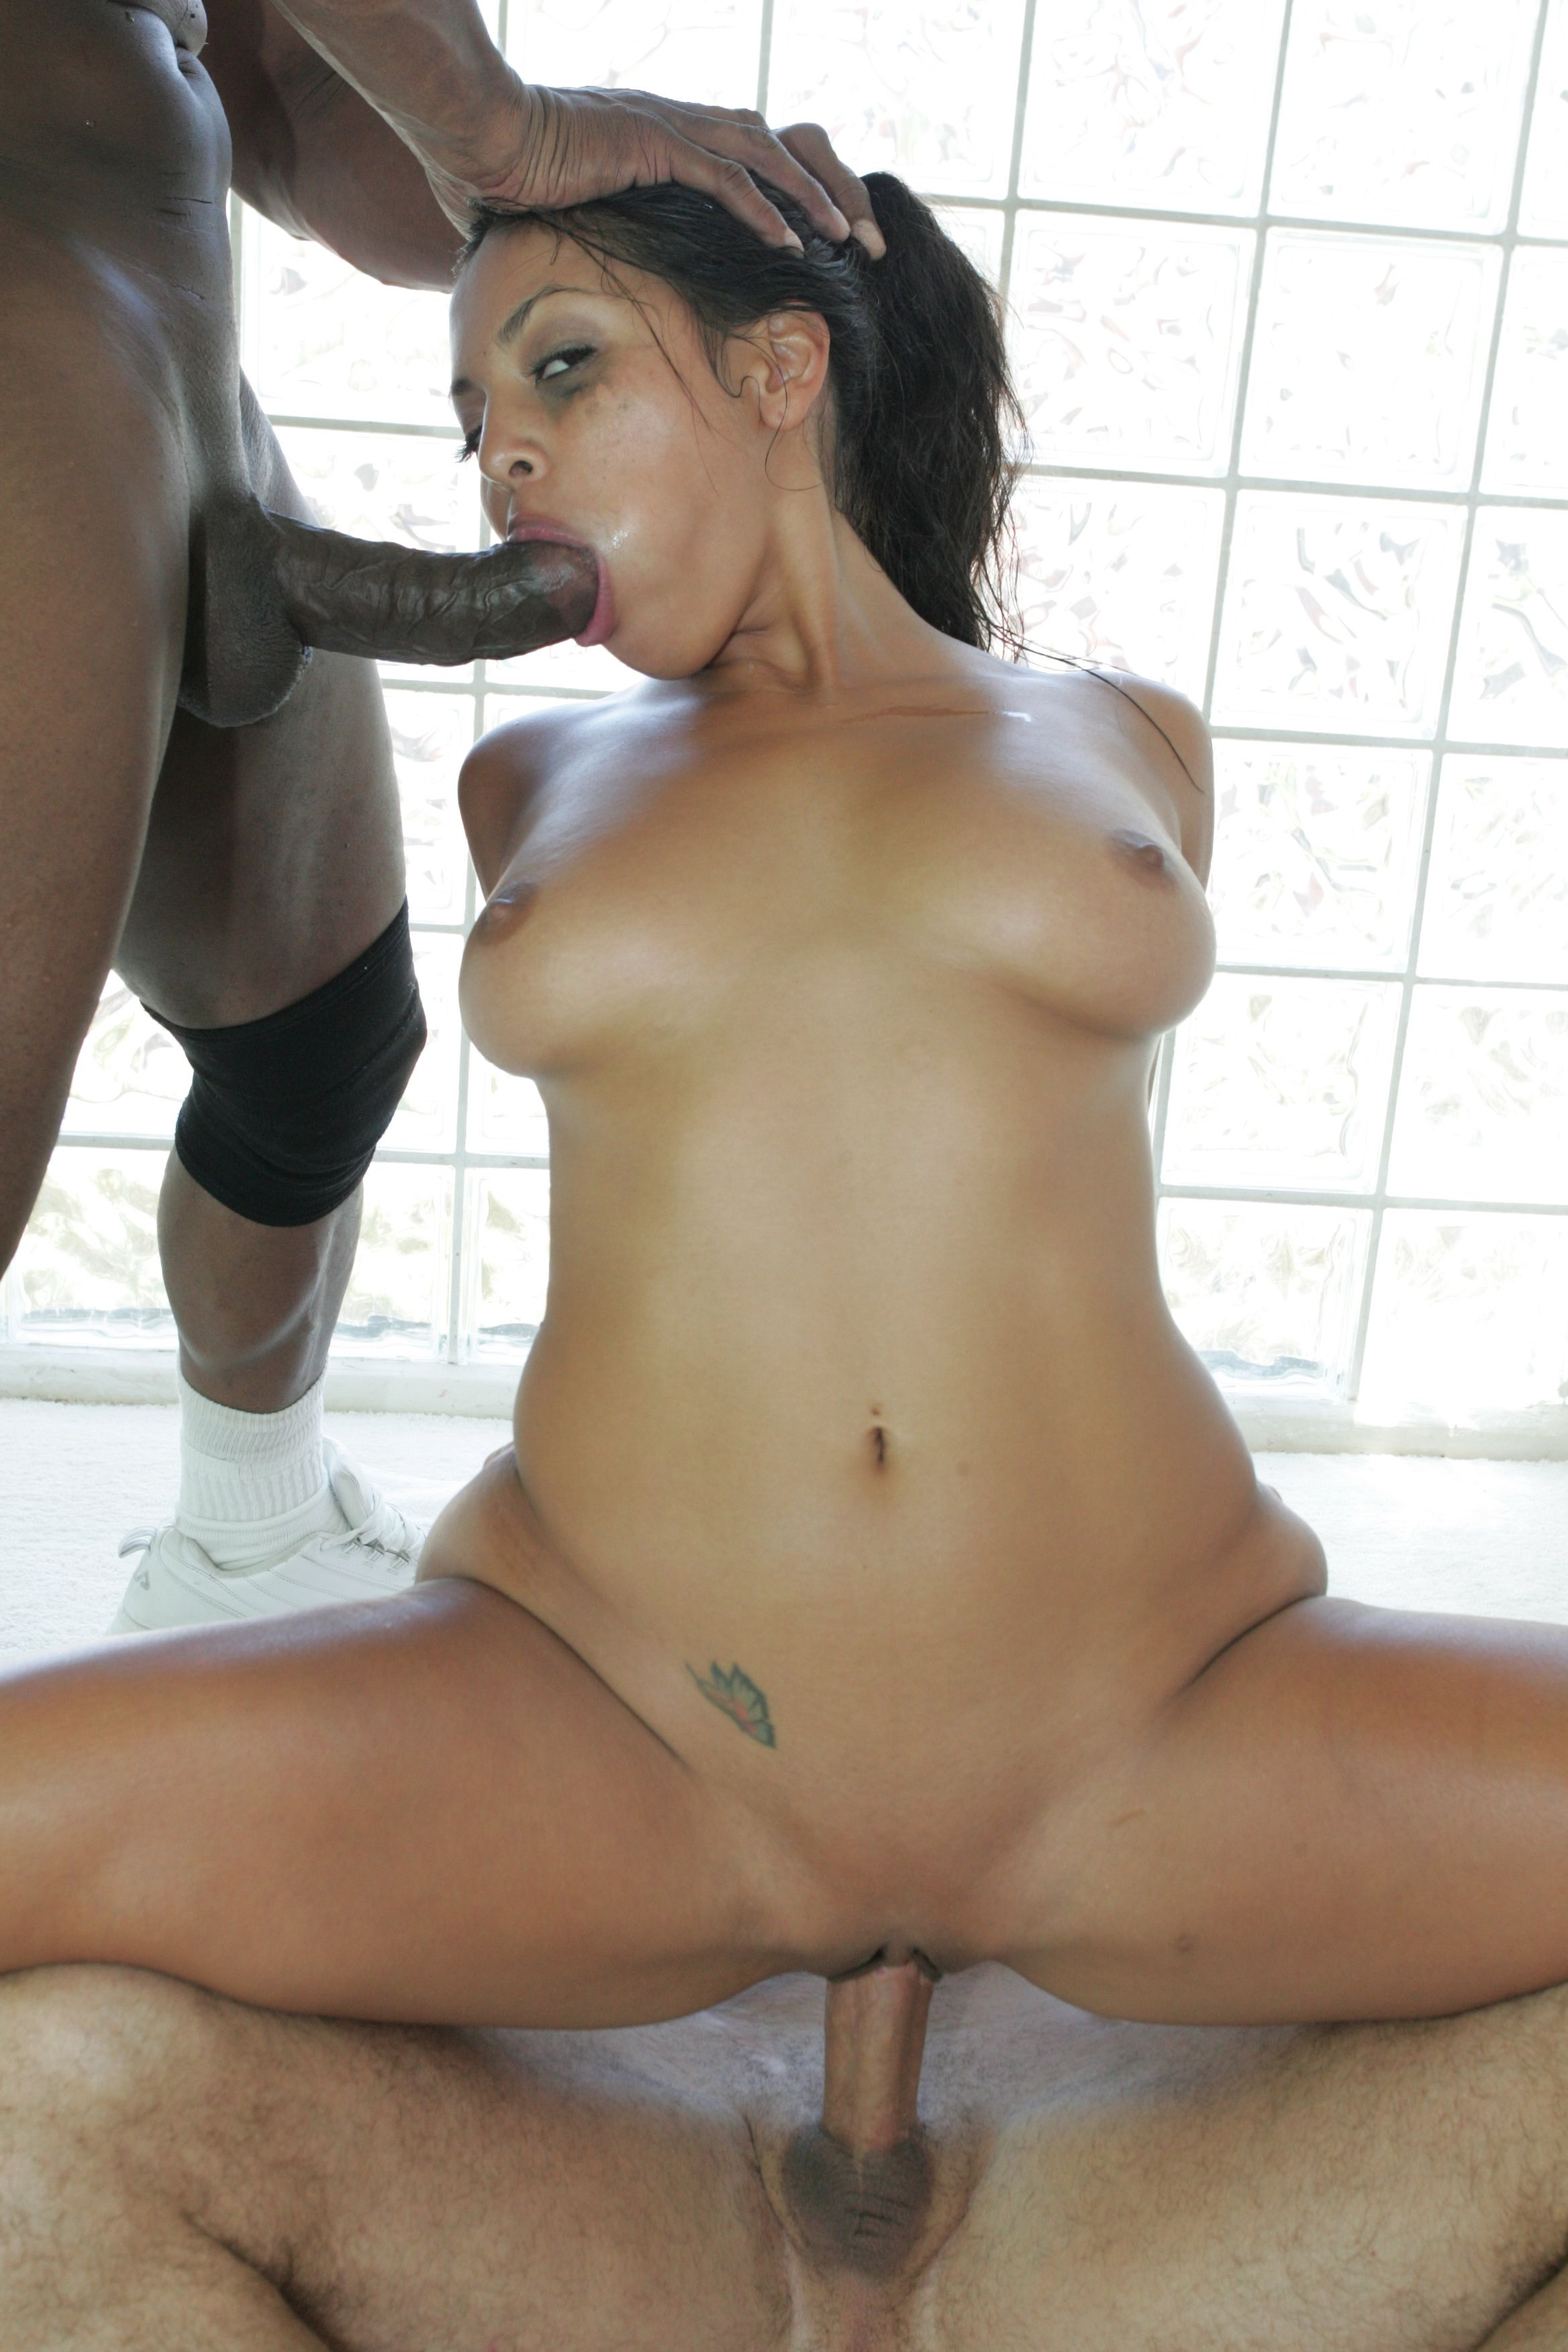 Sharing public slut wife pussy sex images